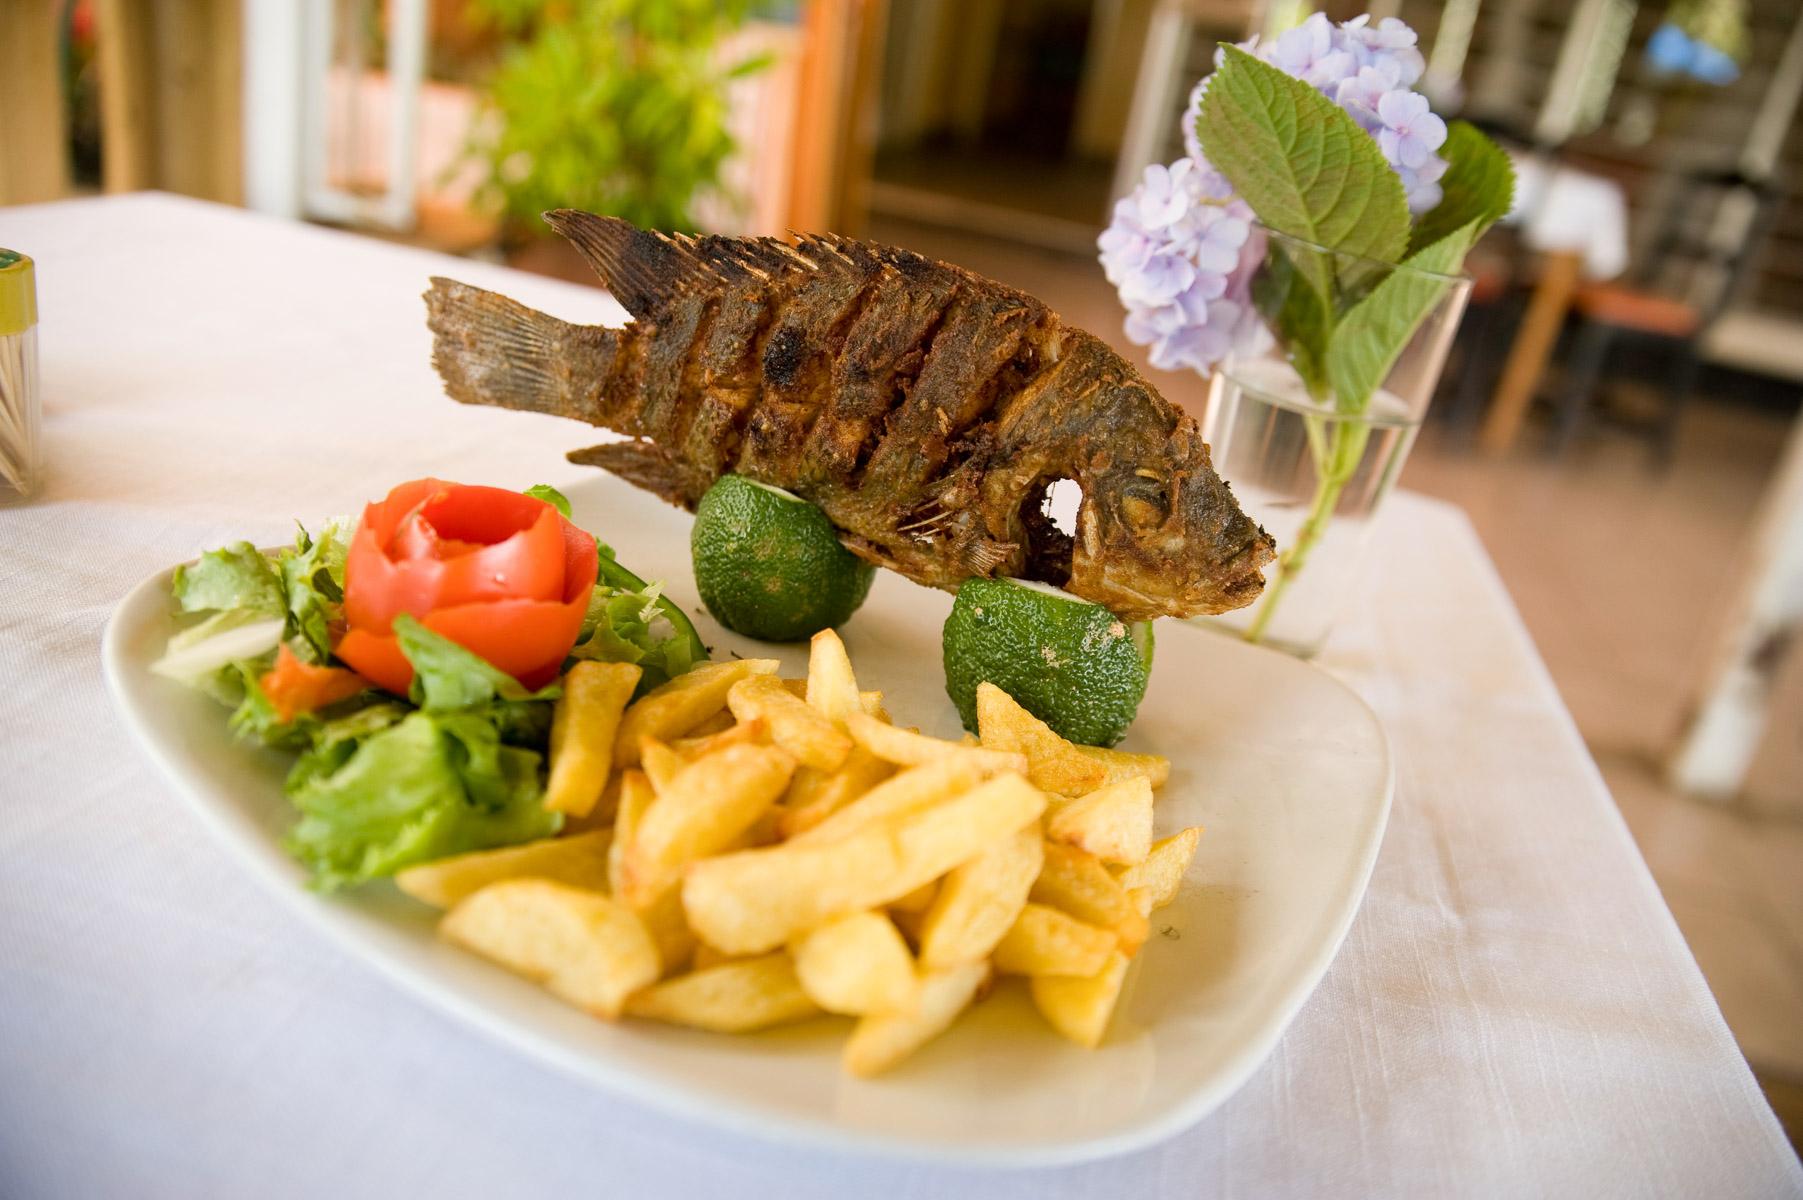 Chez Maky's restaurant  in Blantyre, Malawi. 4/7/2009. ©Vanessa Vick